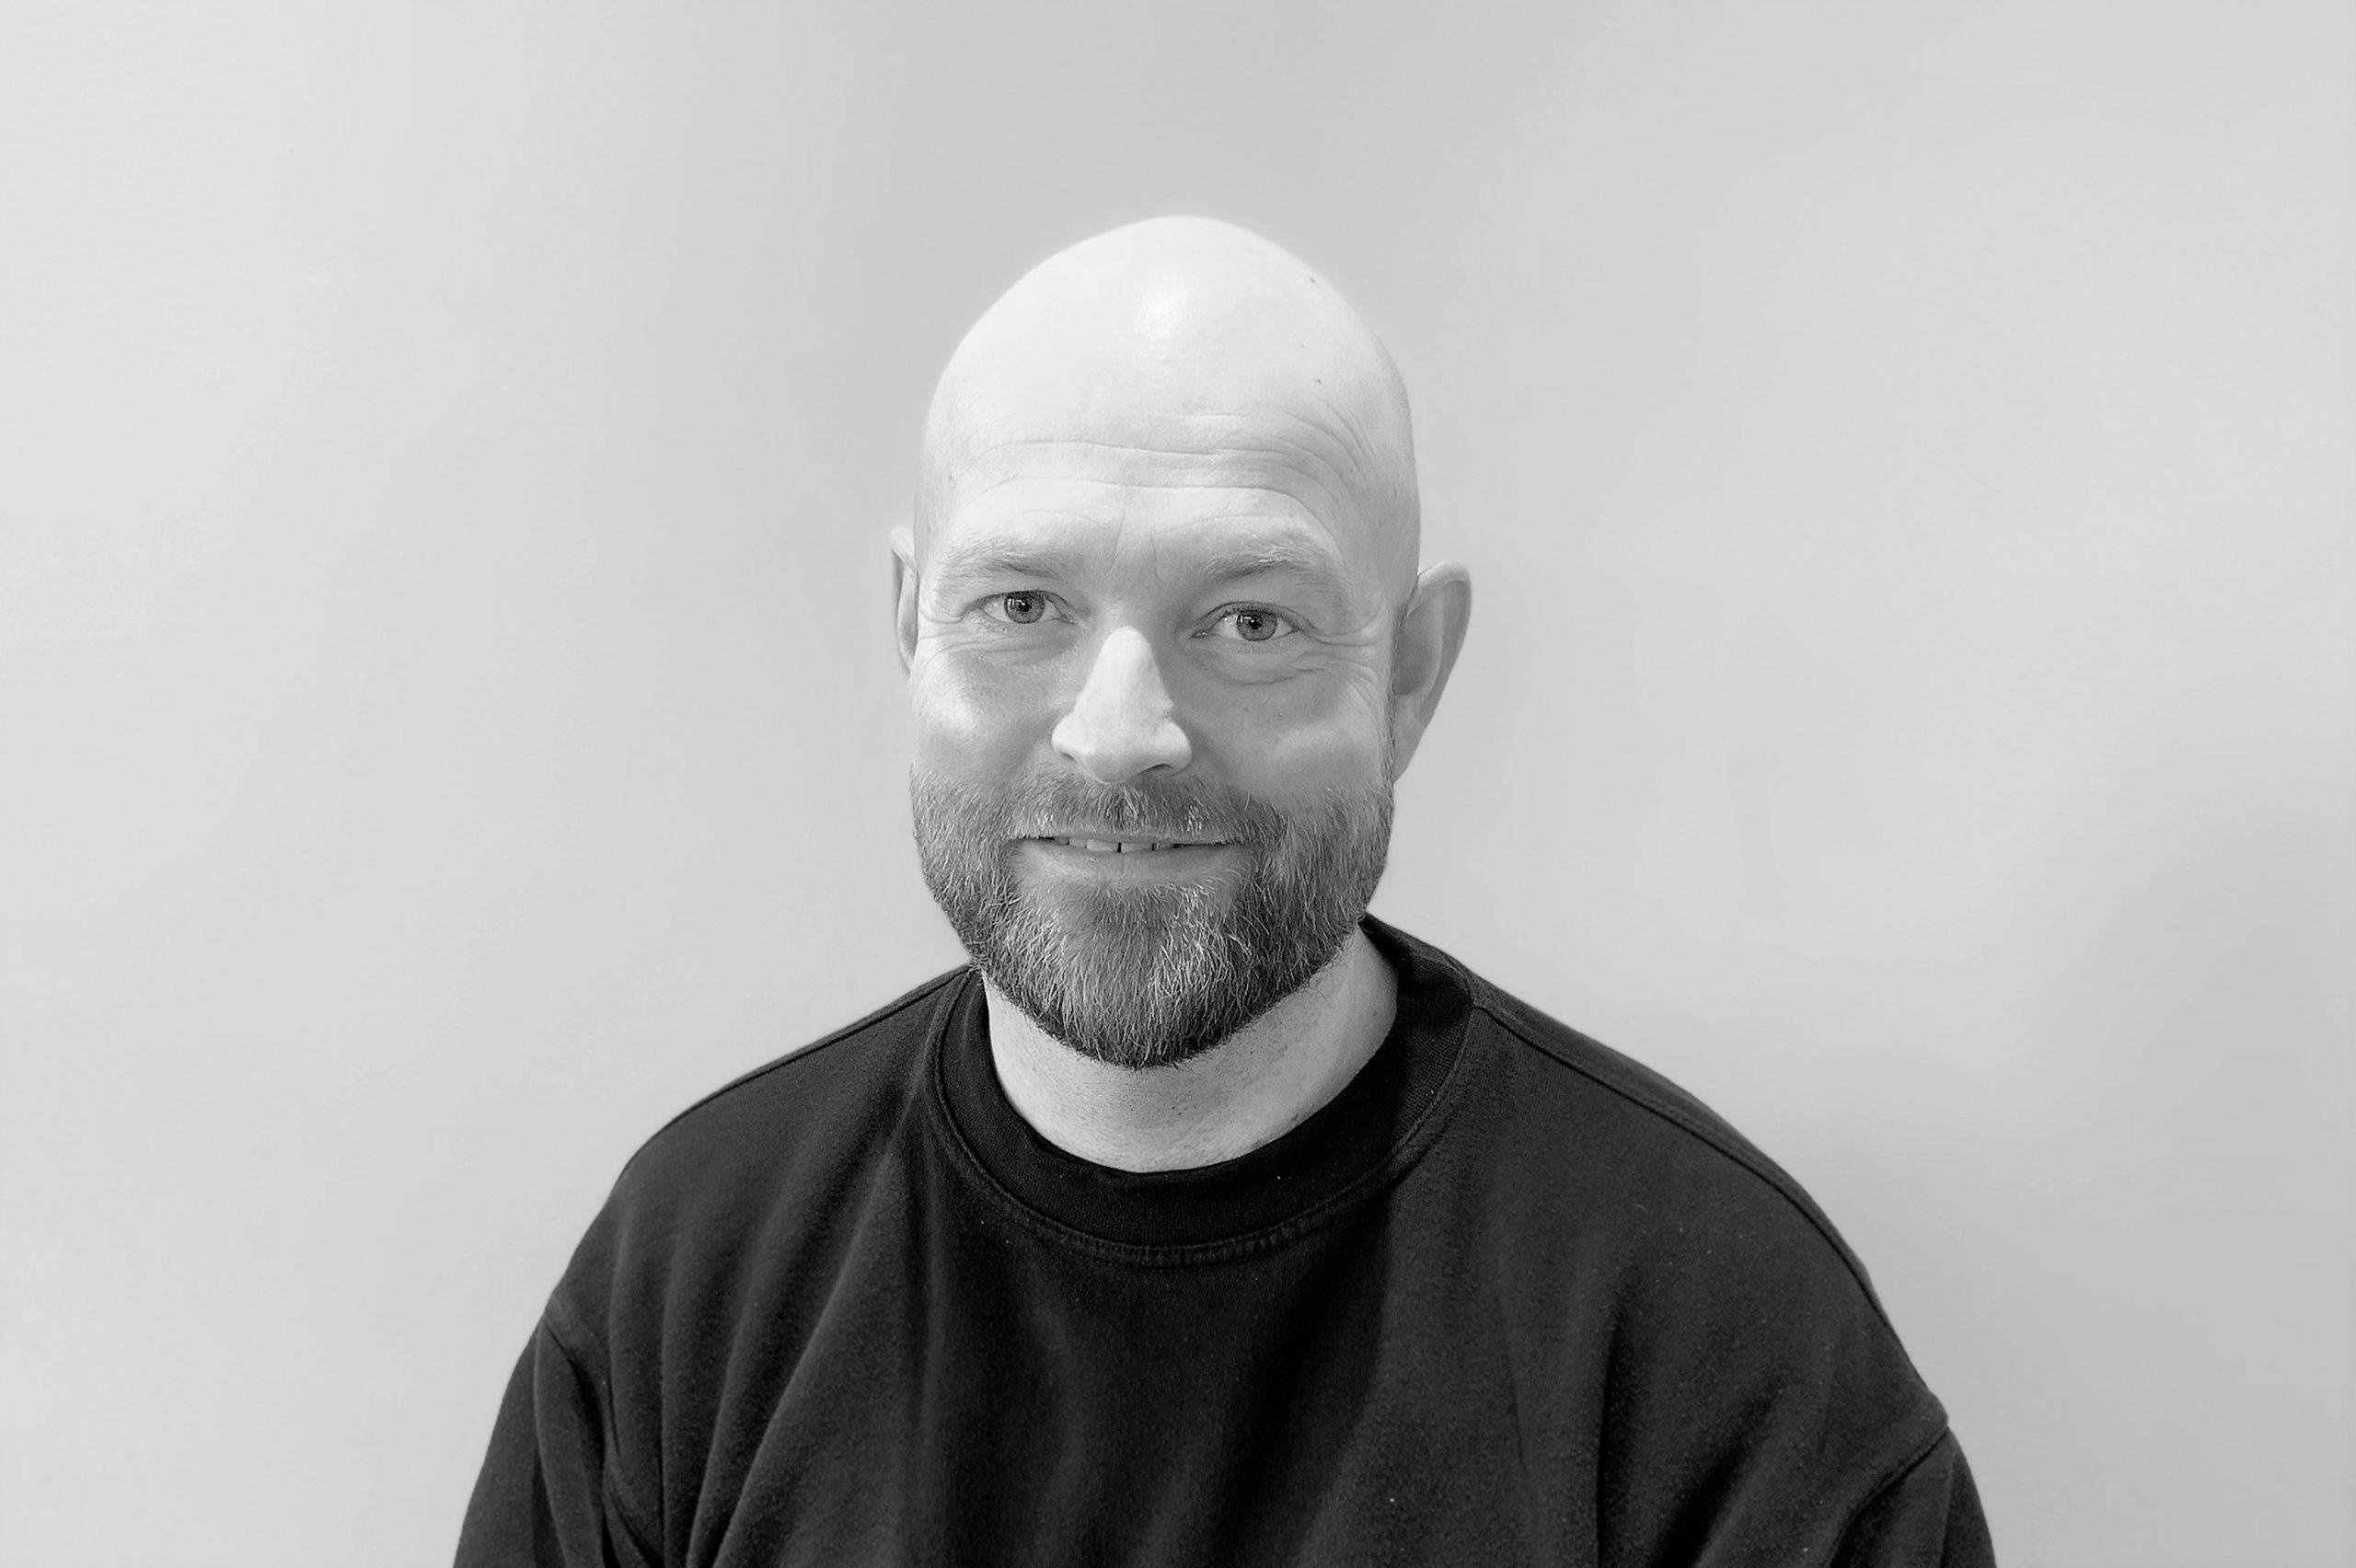 Henrik Wæring Petersen